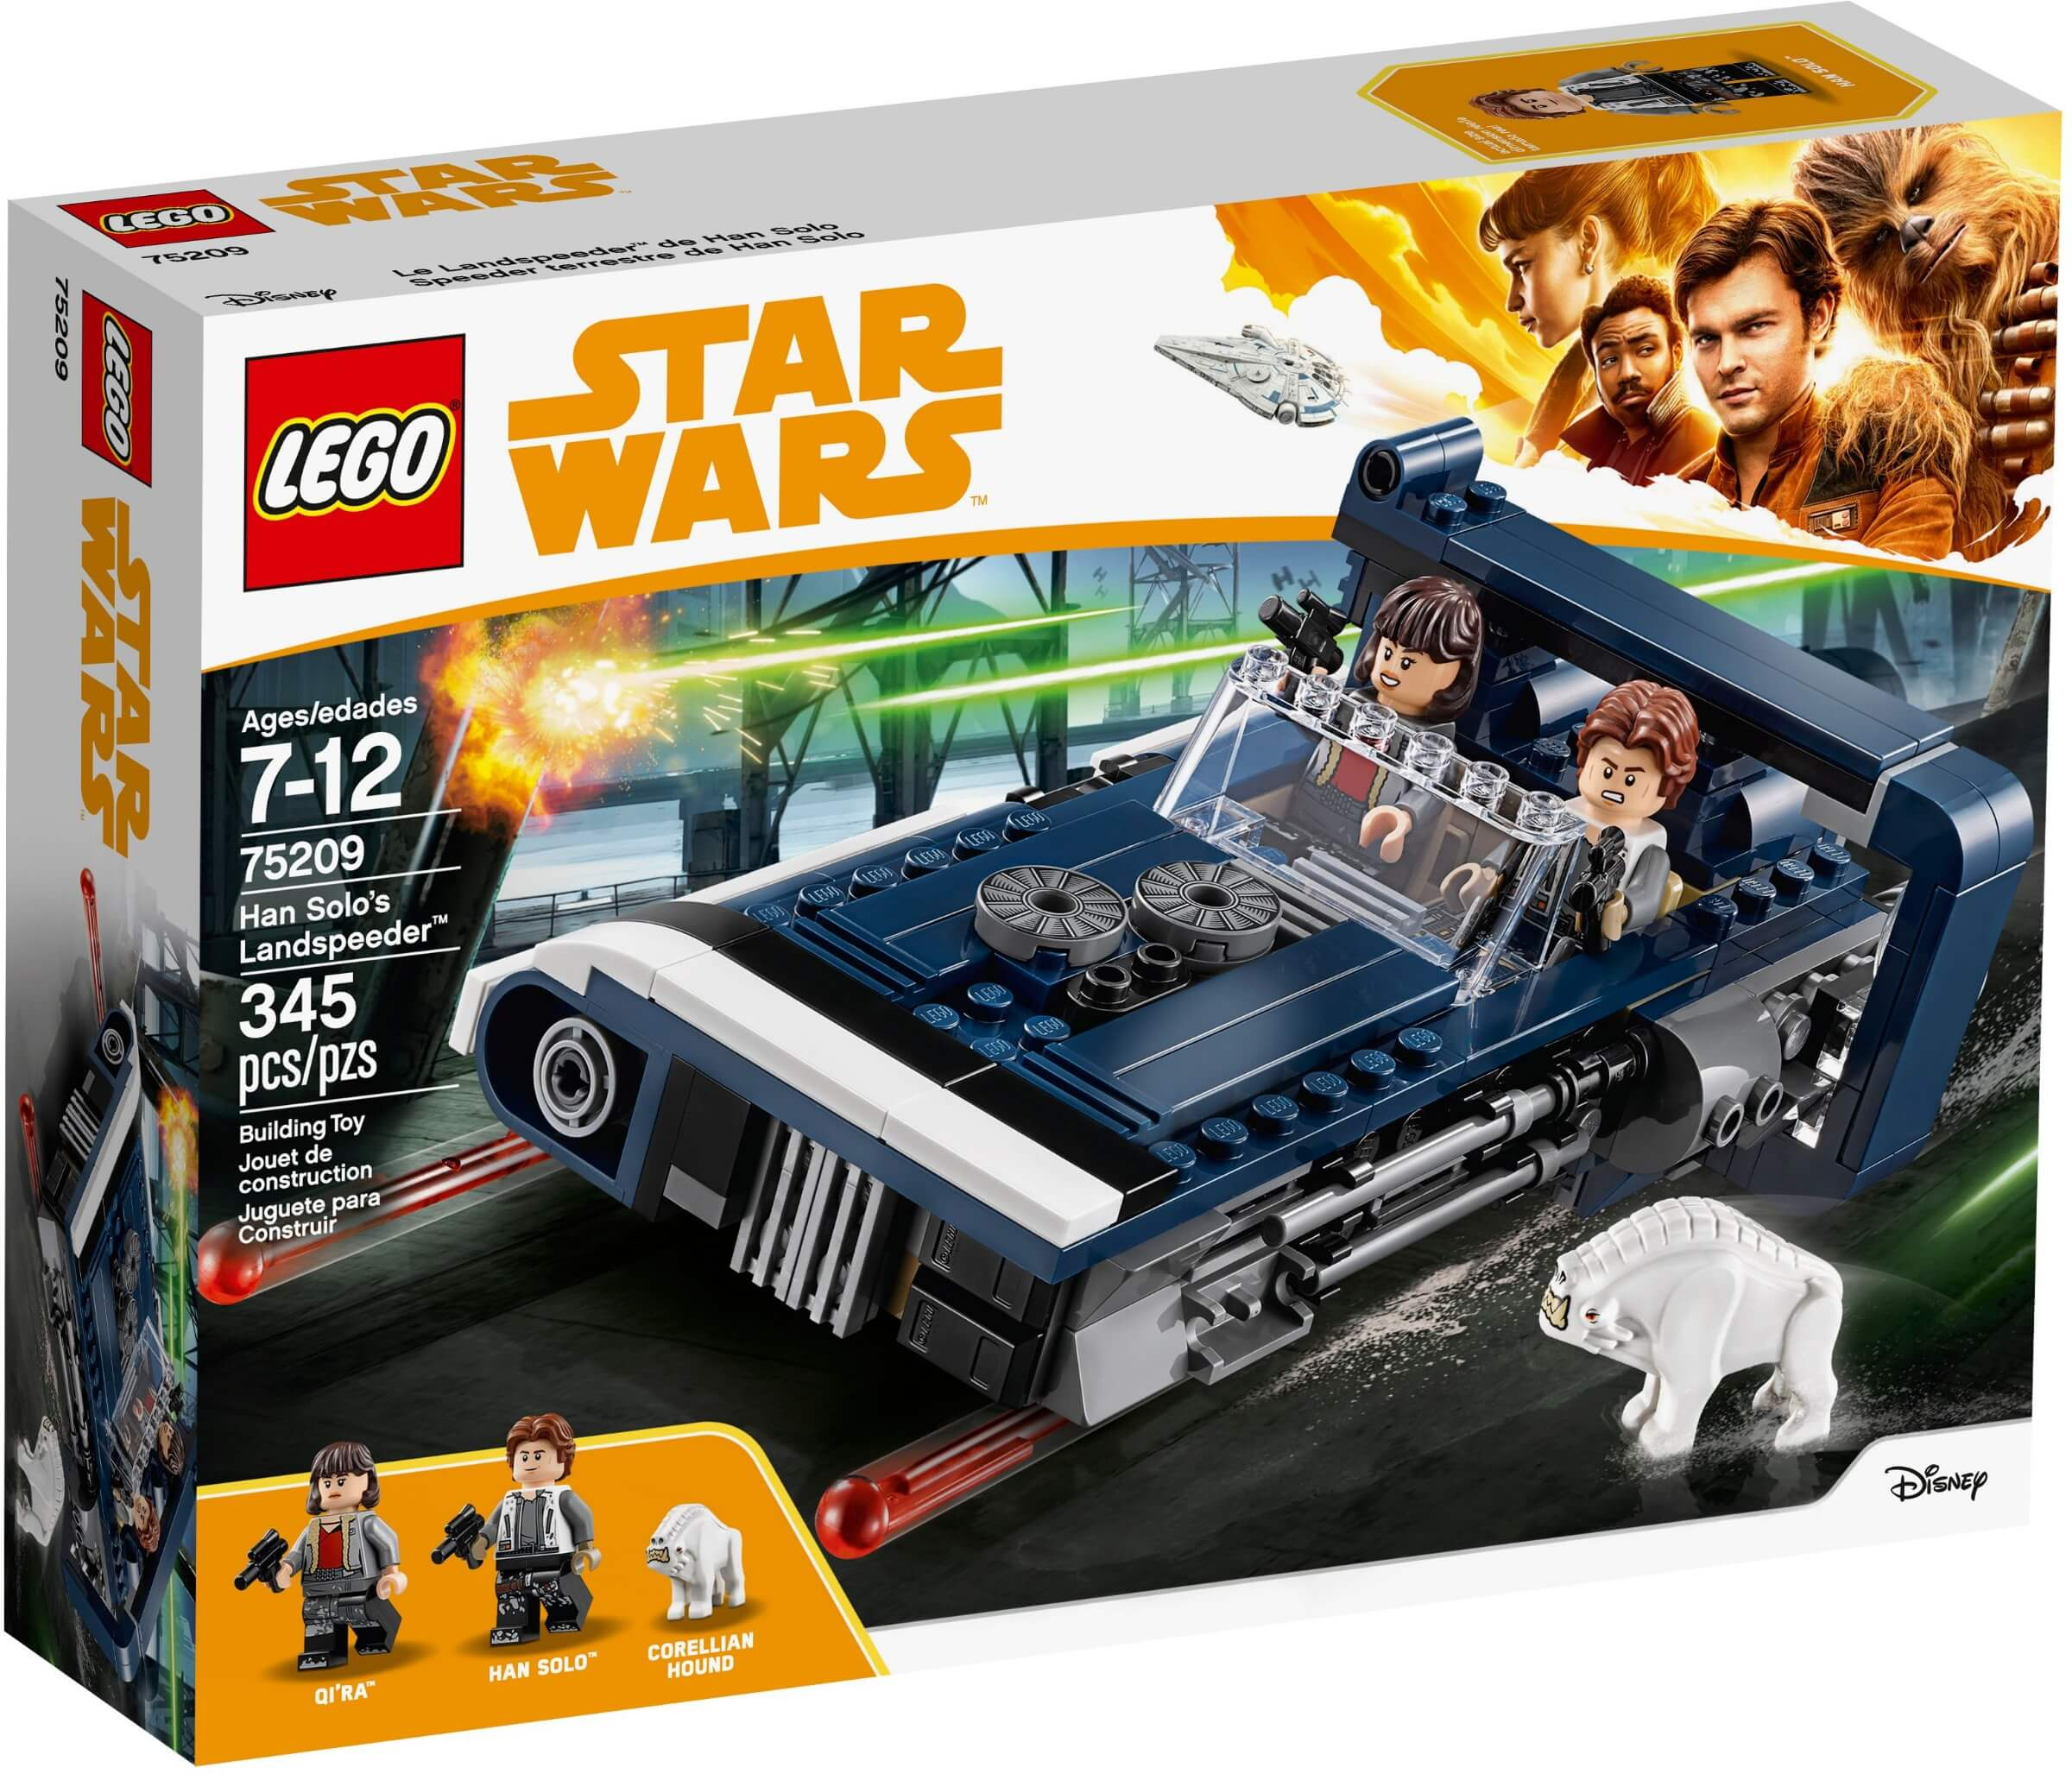 Mua đồ chơi LEGO 75209 - LEGO Star Wars 75209 - Siêu Xe Phản Lực của Han Solo (LEGO 75209 Han Solo's Landspeeder)